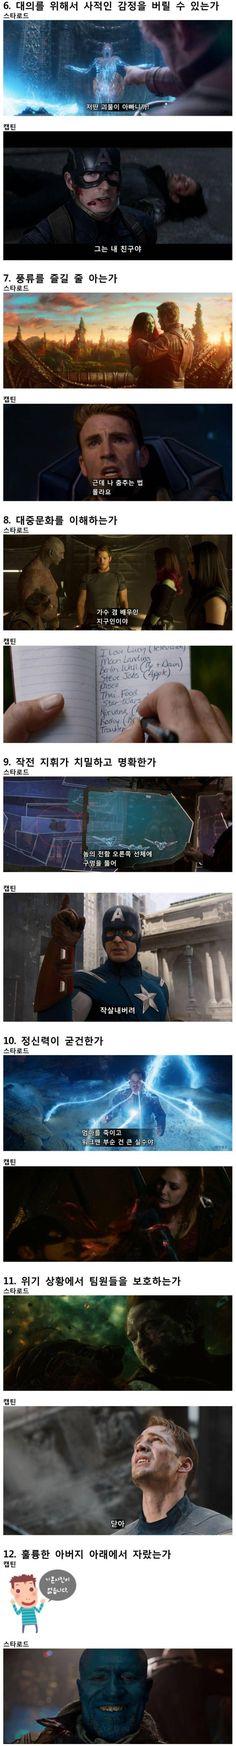 Marvel Heroes, Marvel Avengers, Nerd Party, Marvel Universe, Loki, Comedy, America, Superhero, Humor